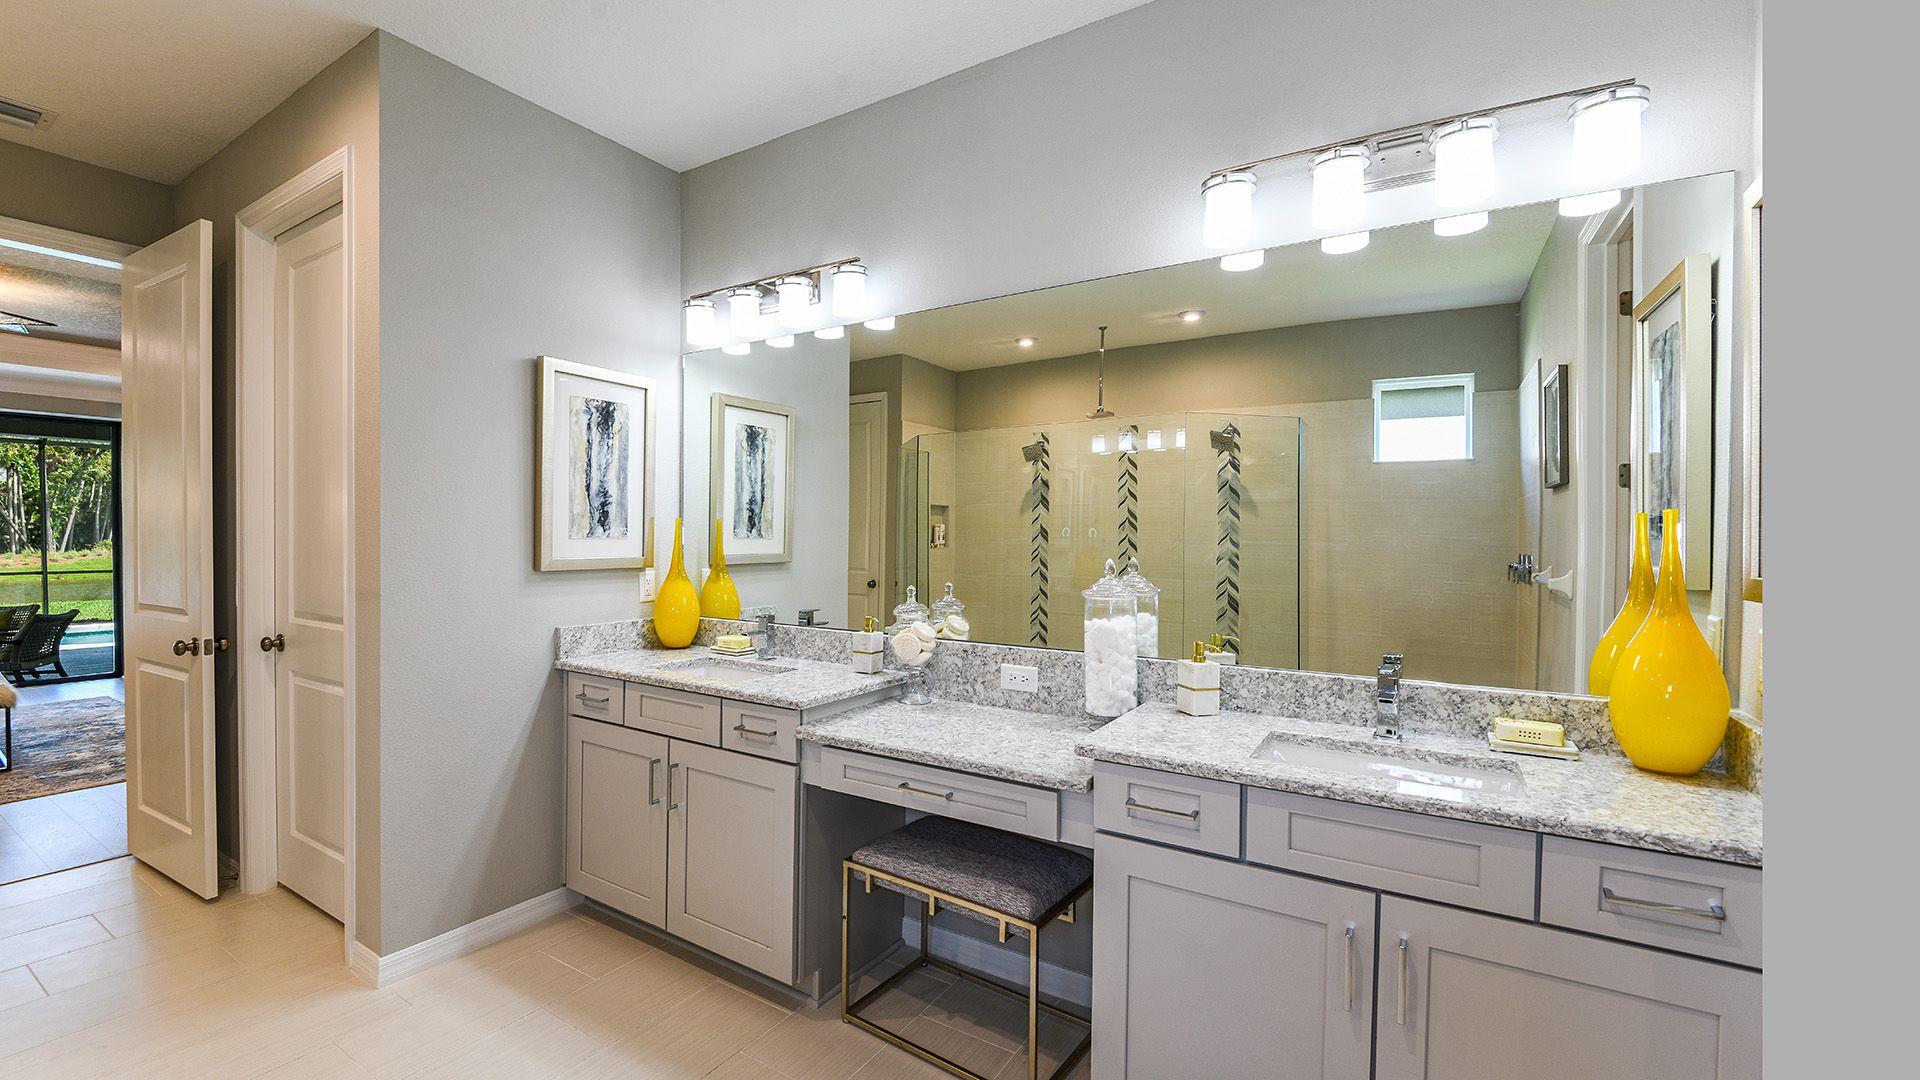 Bathroom featured in the Sand Key By Taylor Morrison in Sarasota-Bradenton, FL